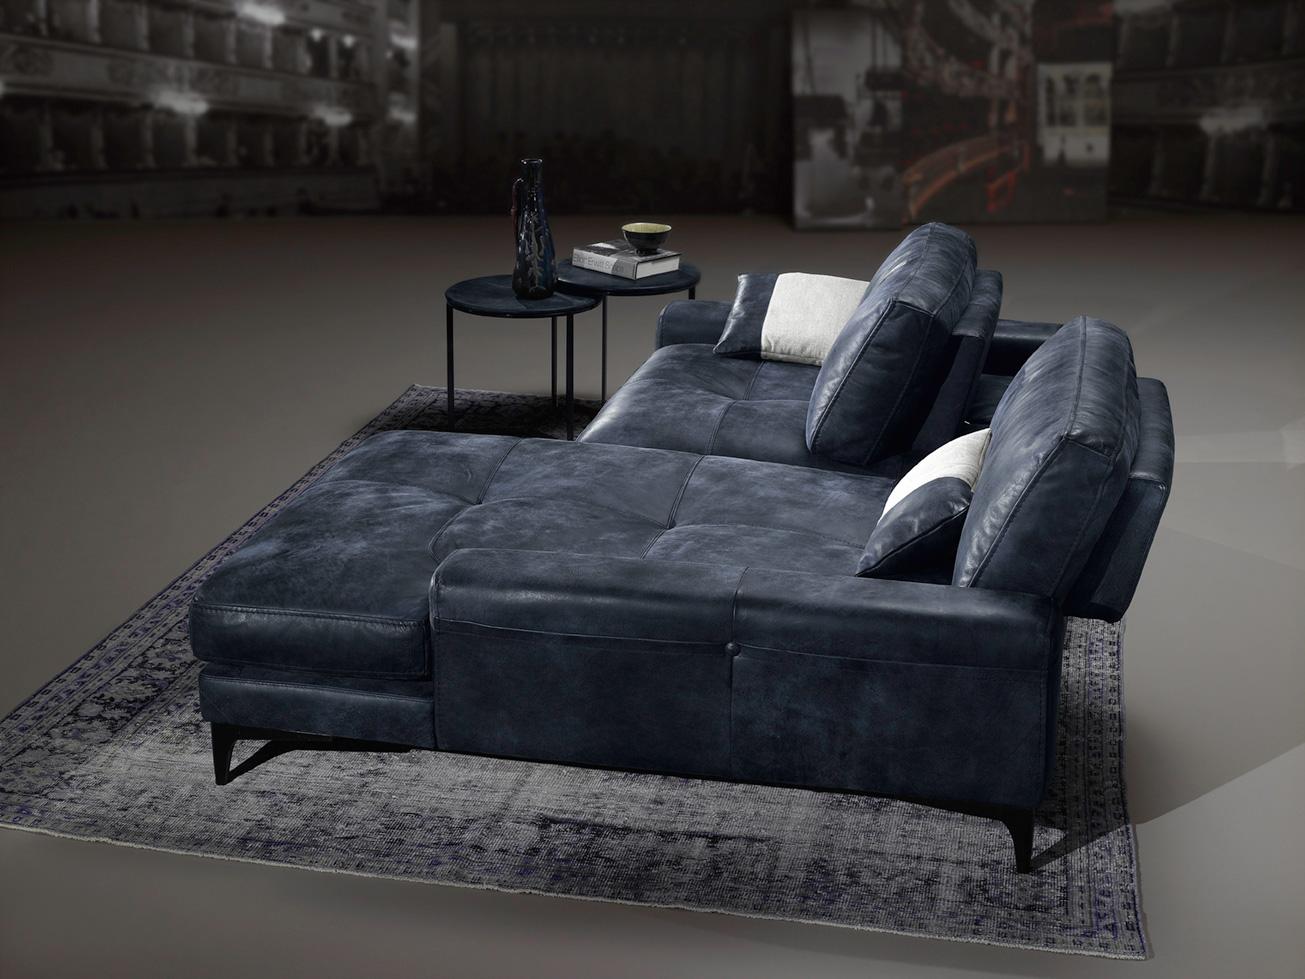 leather sofa chaise long, polithrona krevati, mikros kanapes gia mikro xoro, small size sofa for small space, mple dermatinos kanapes me mavra podia, blue real leather sofa with black legs,